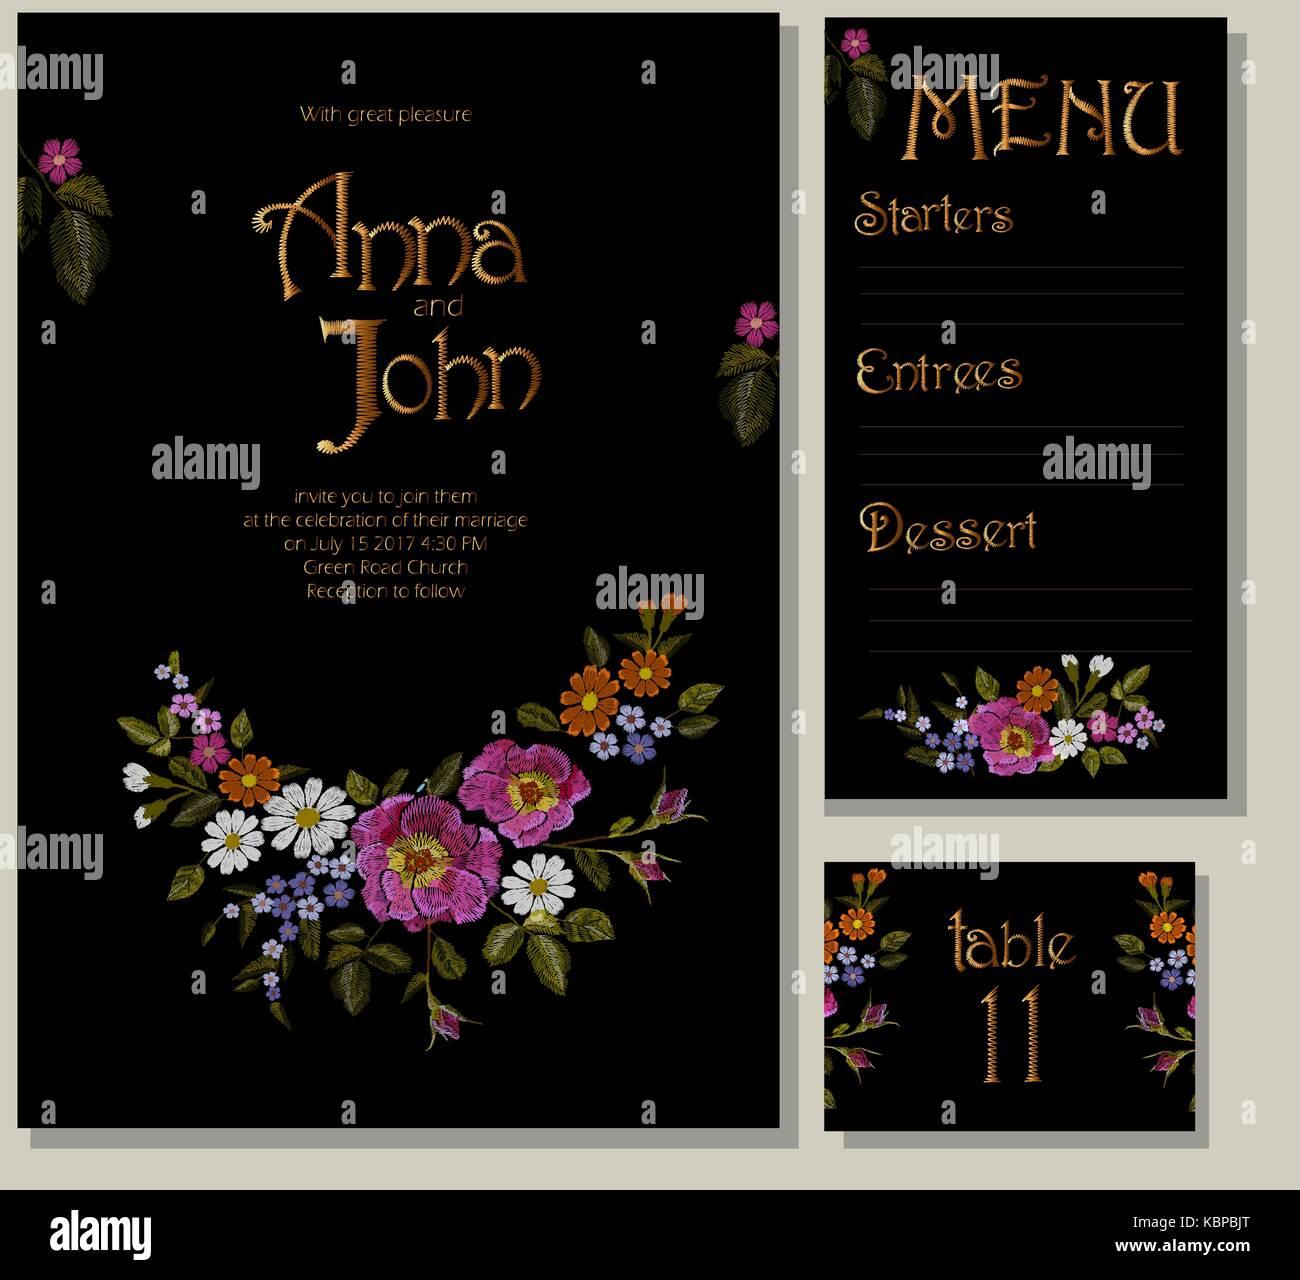 floral wedding cards design suite template rustic field flower wild